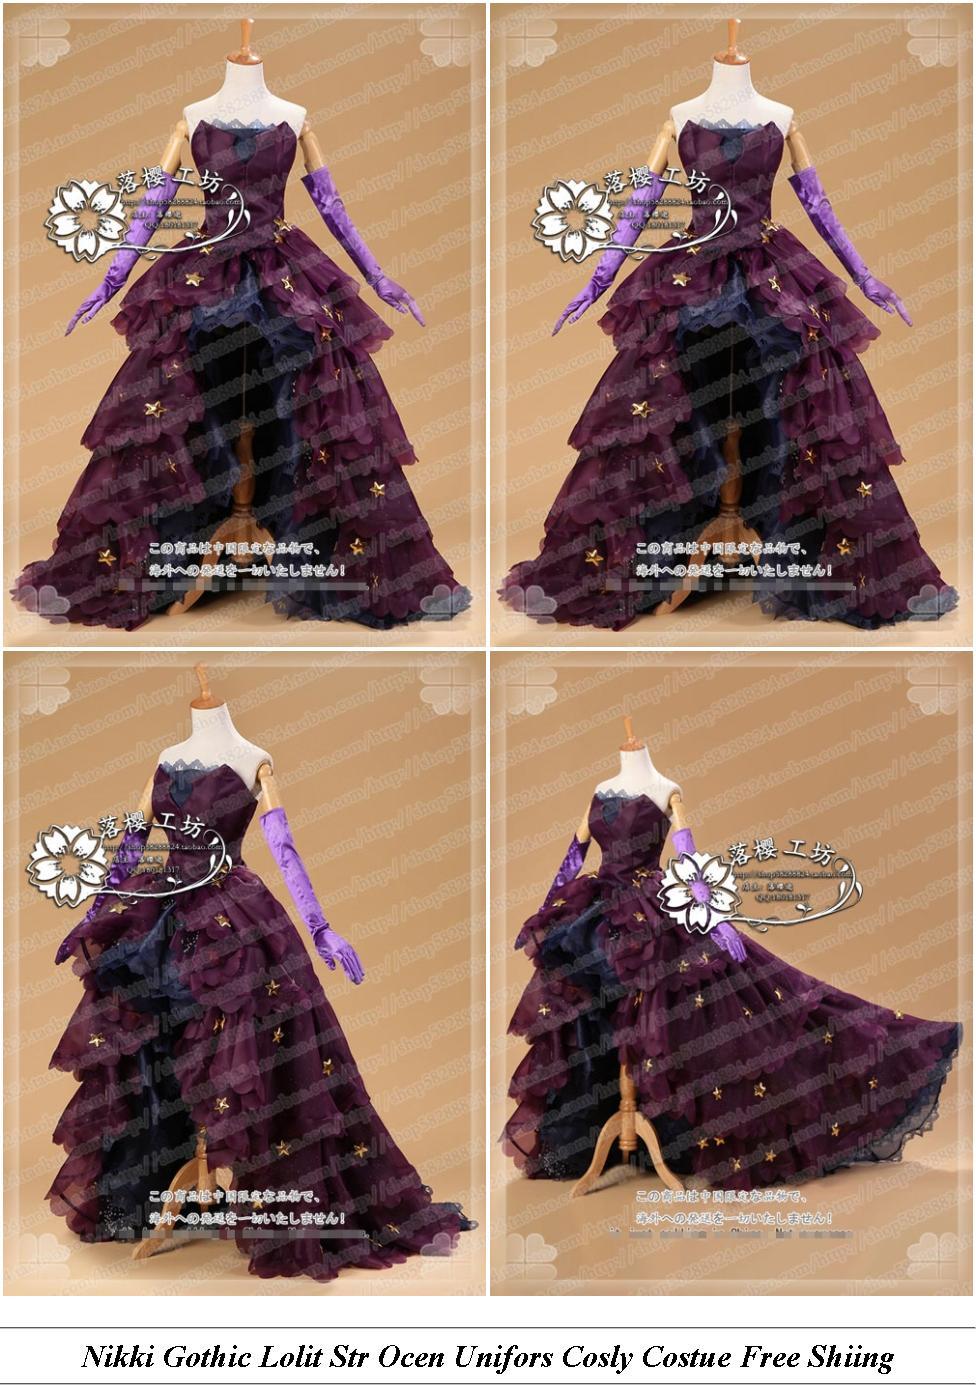 Uy Wedding Dresses Online Australia - Vintage Style Clothing Uk Online - Short Lack Strapless Dress With Pockets